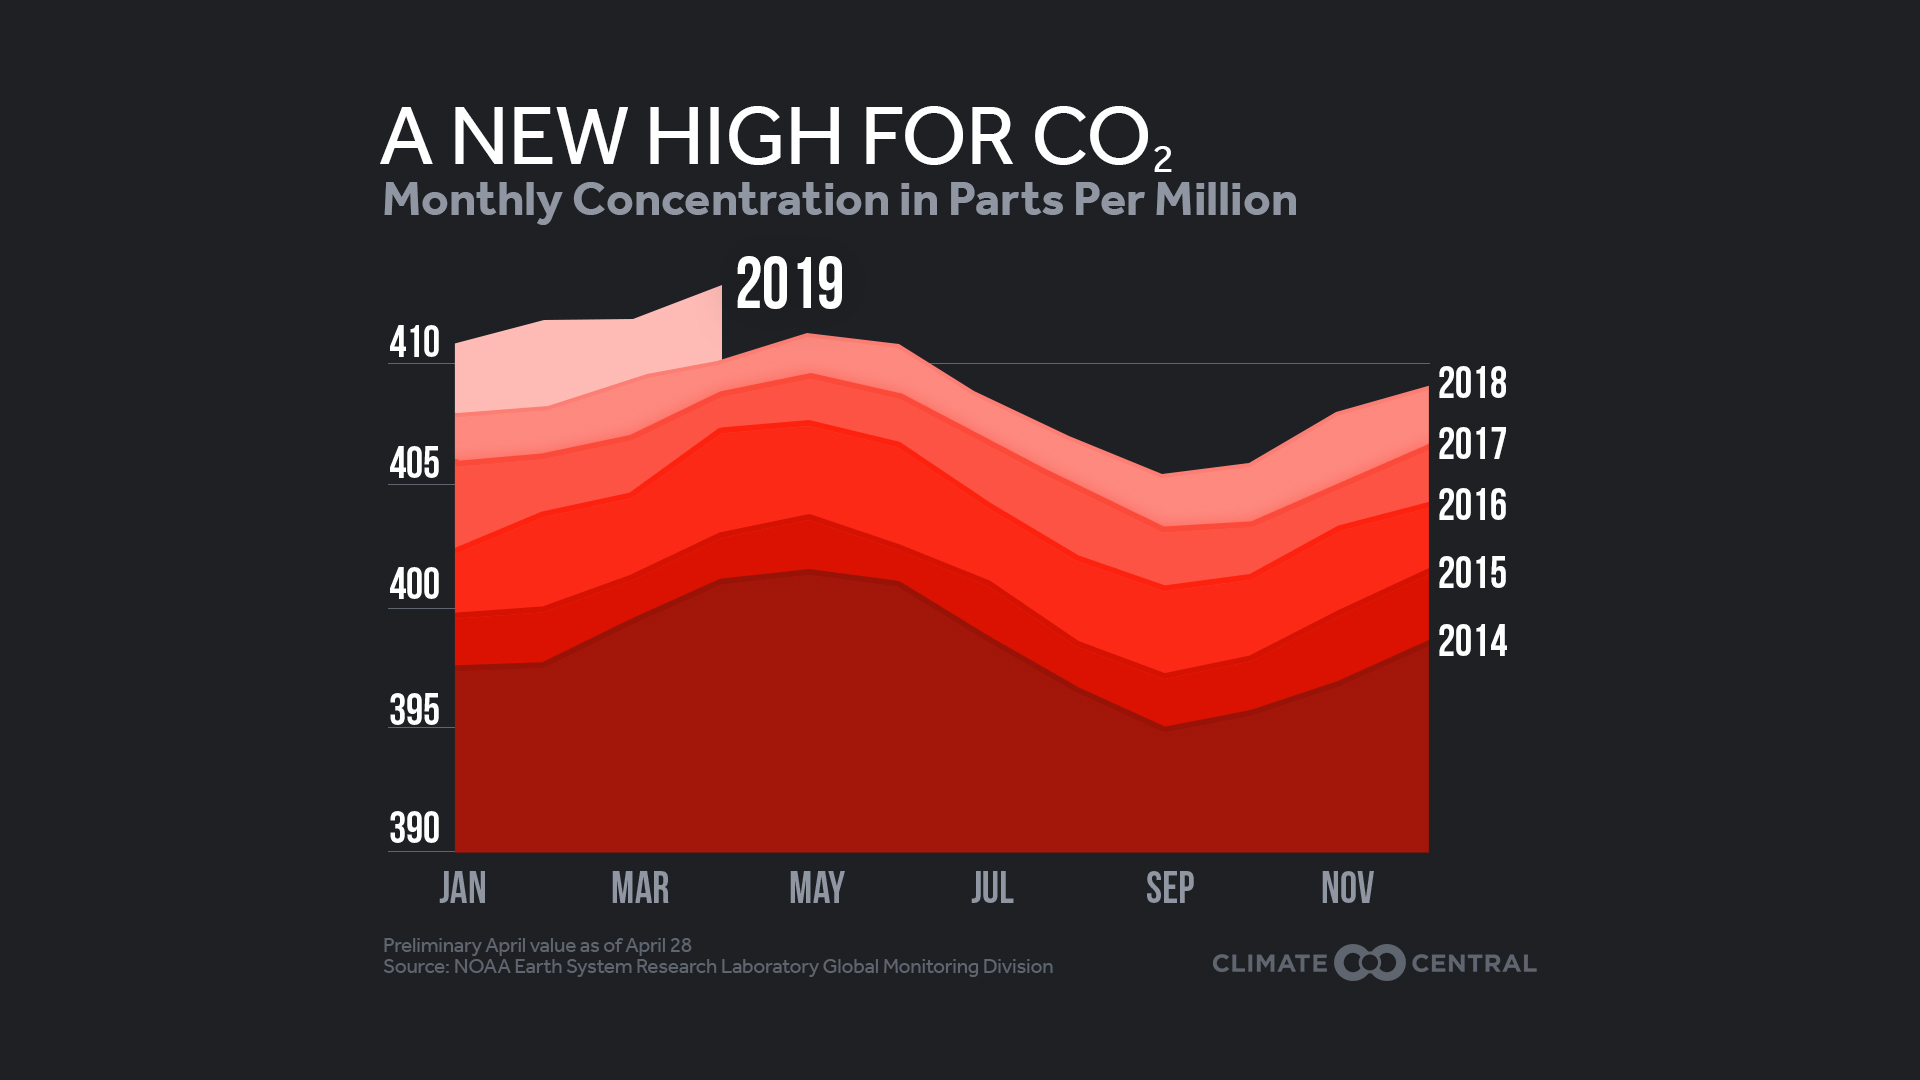 CO2 Concentrations Rising Past 400 Parts Per Million